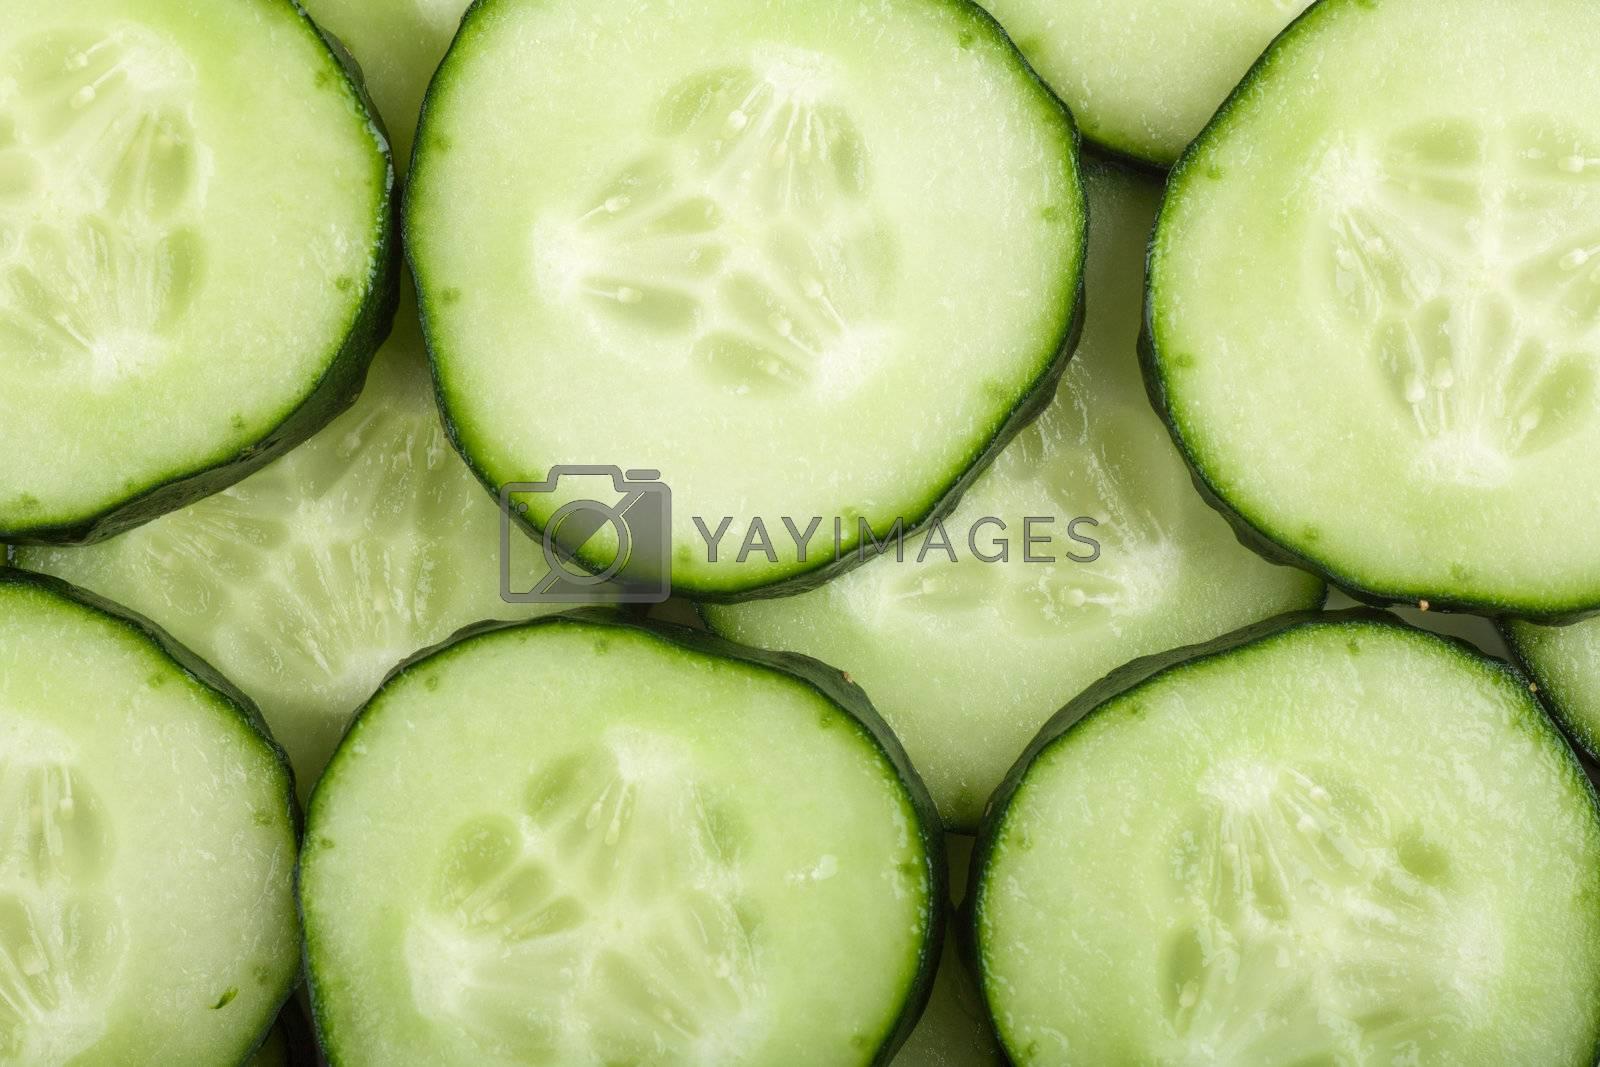 Macro view of cucumber slices